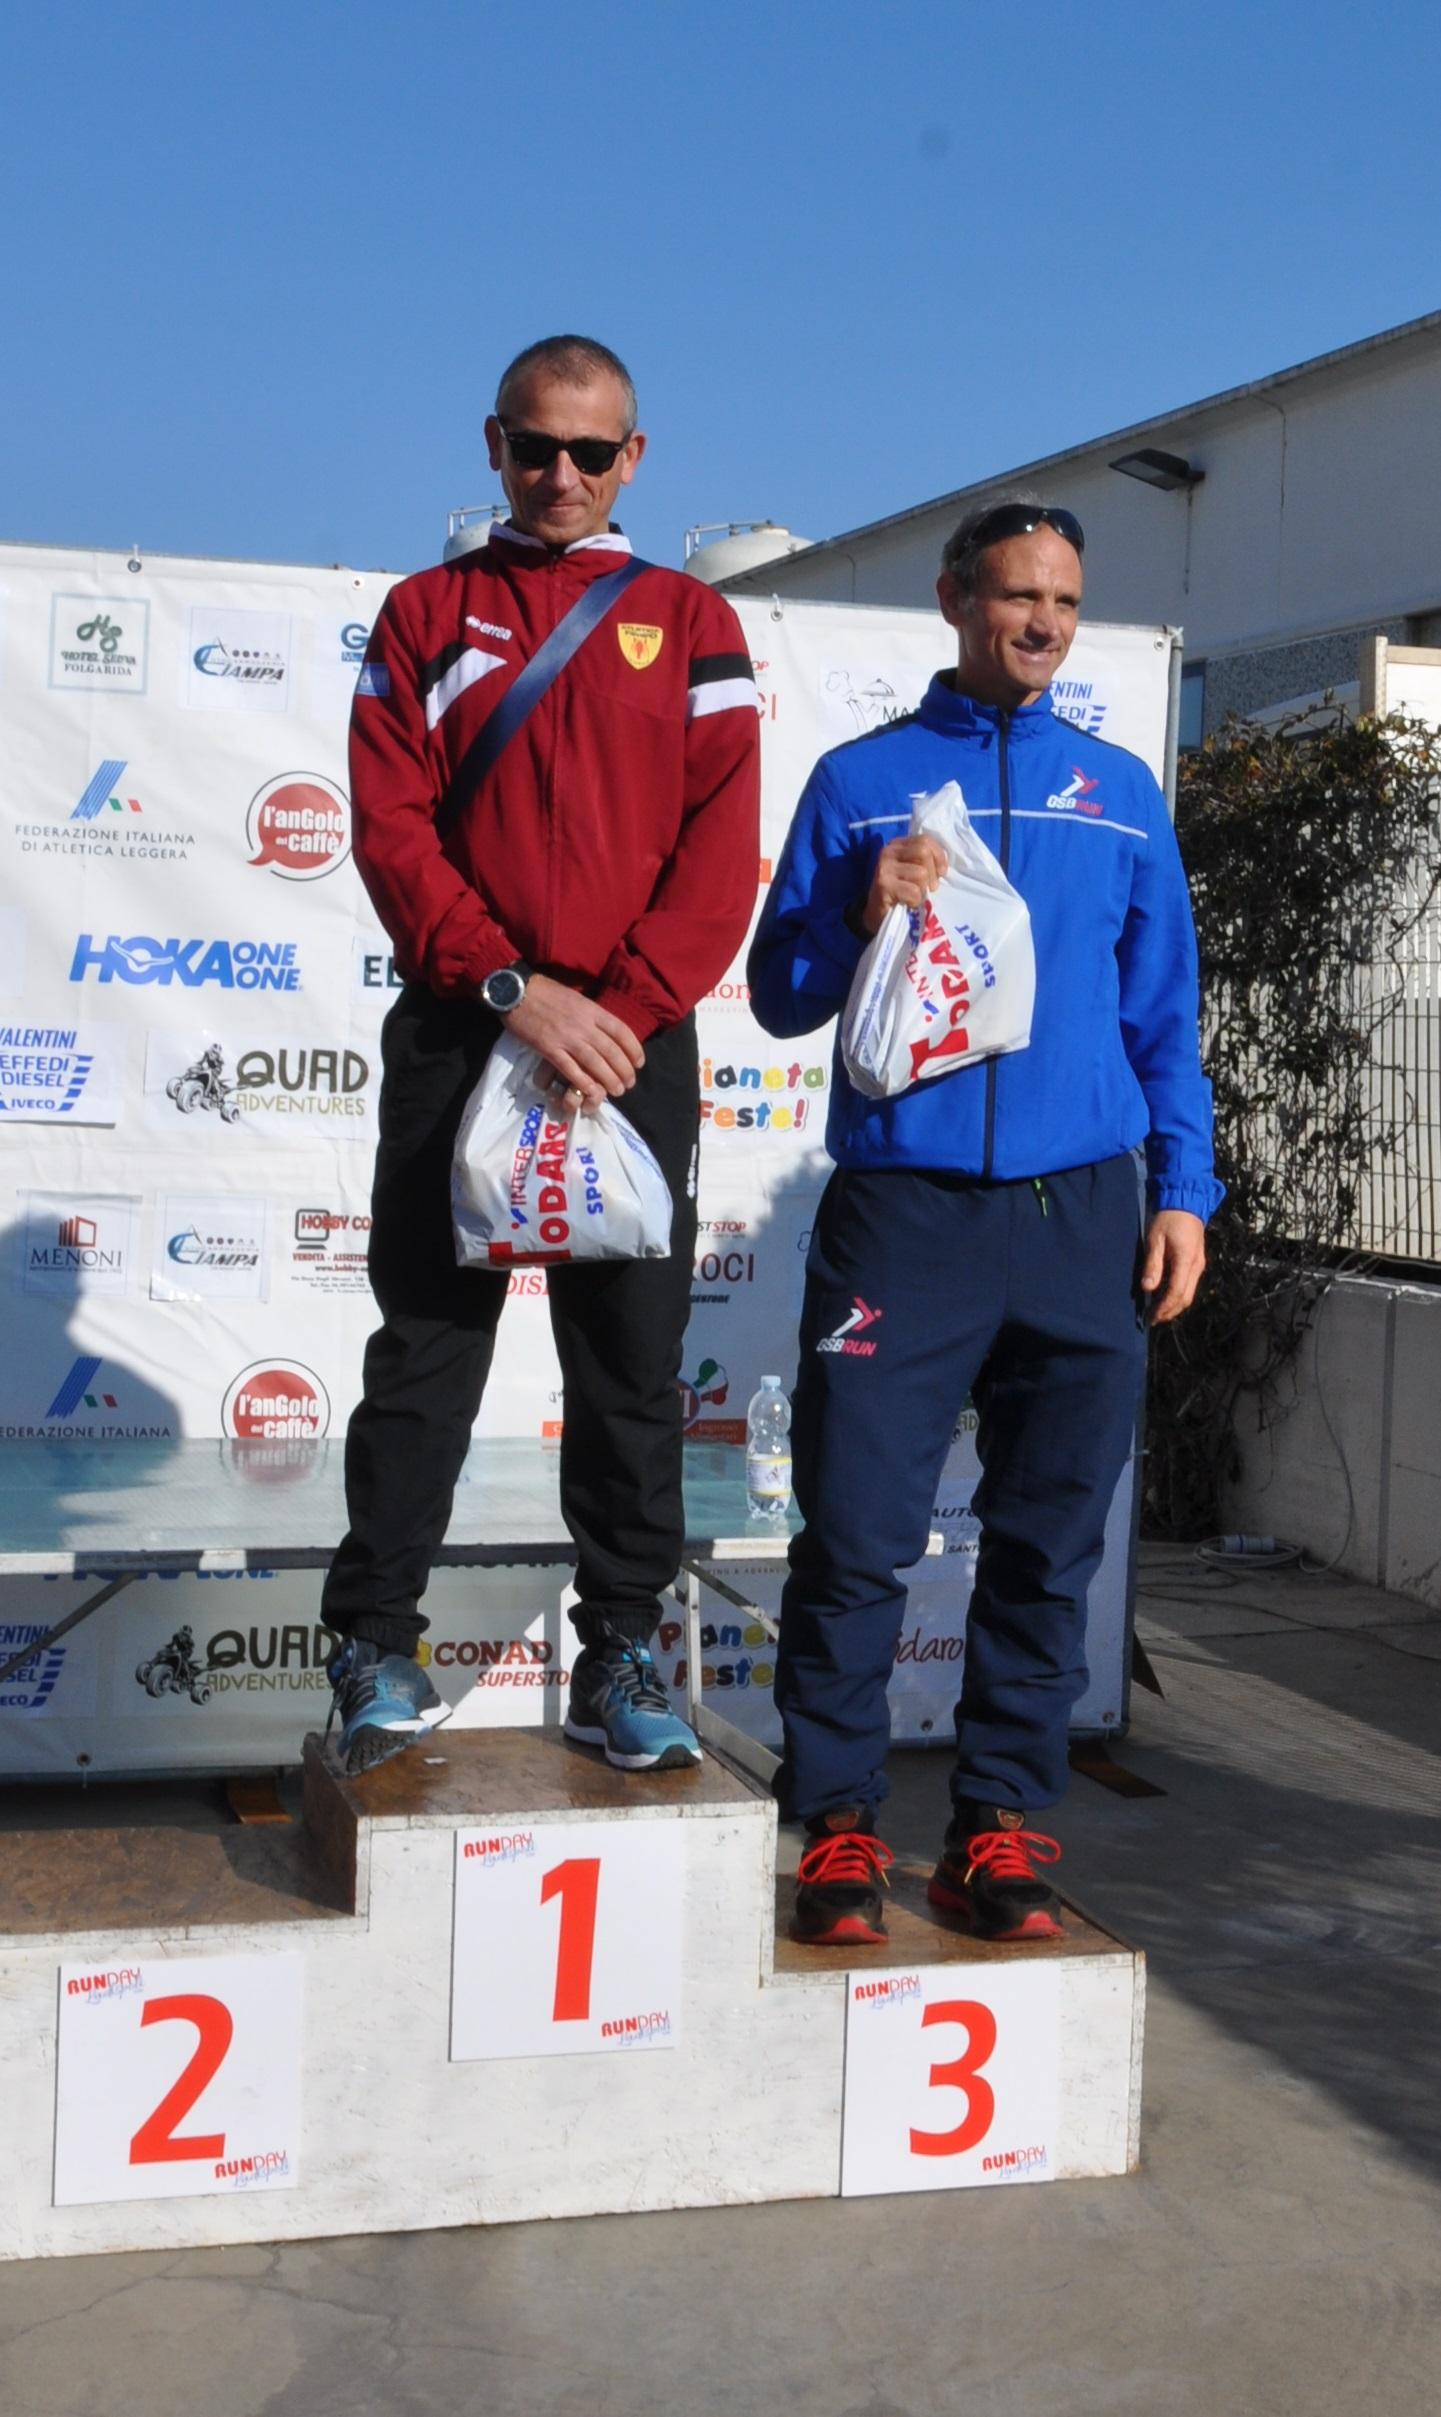 Ladispoli runners